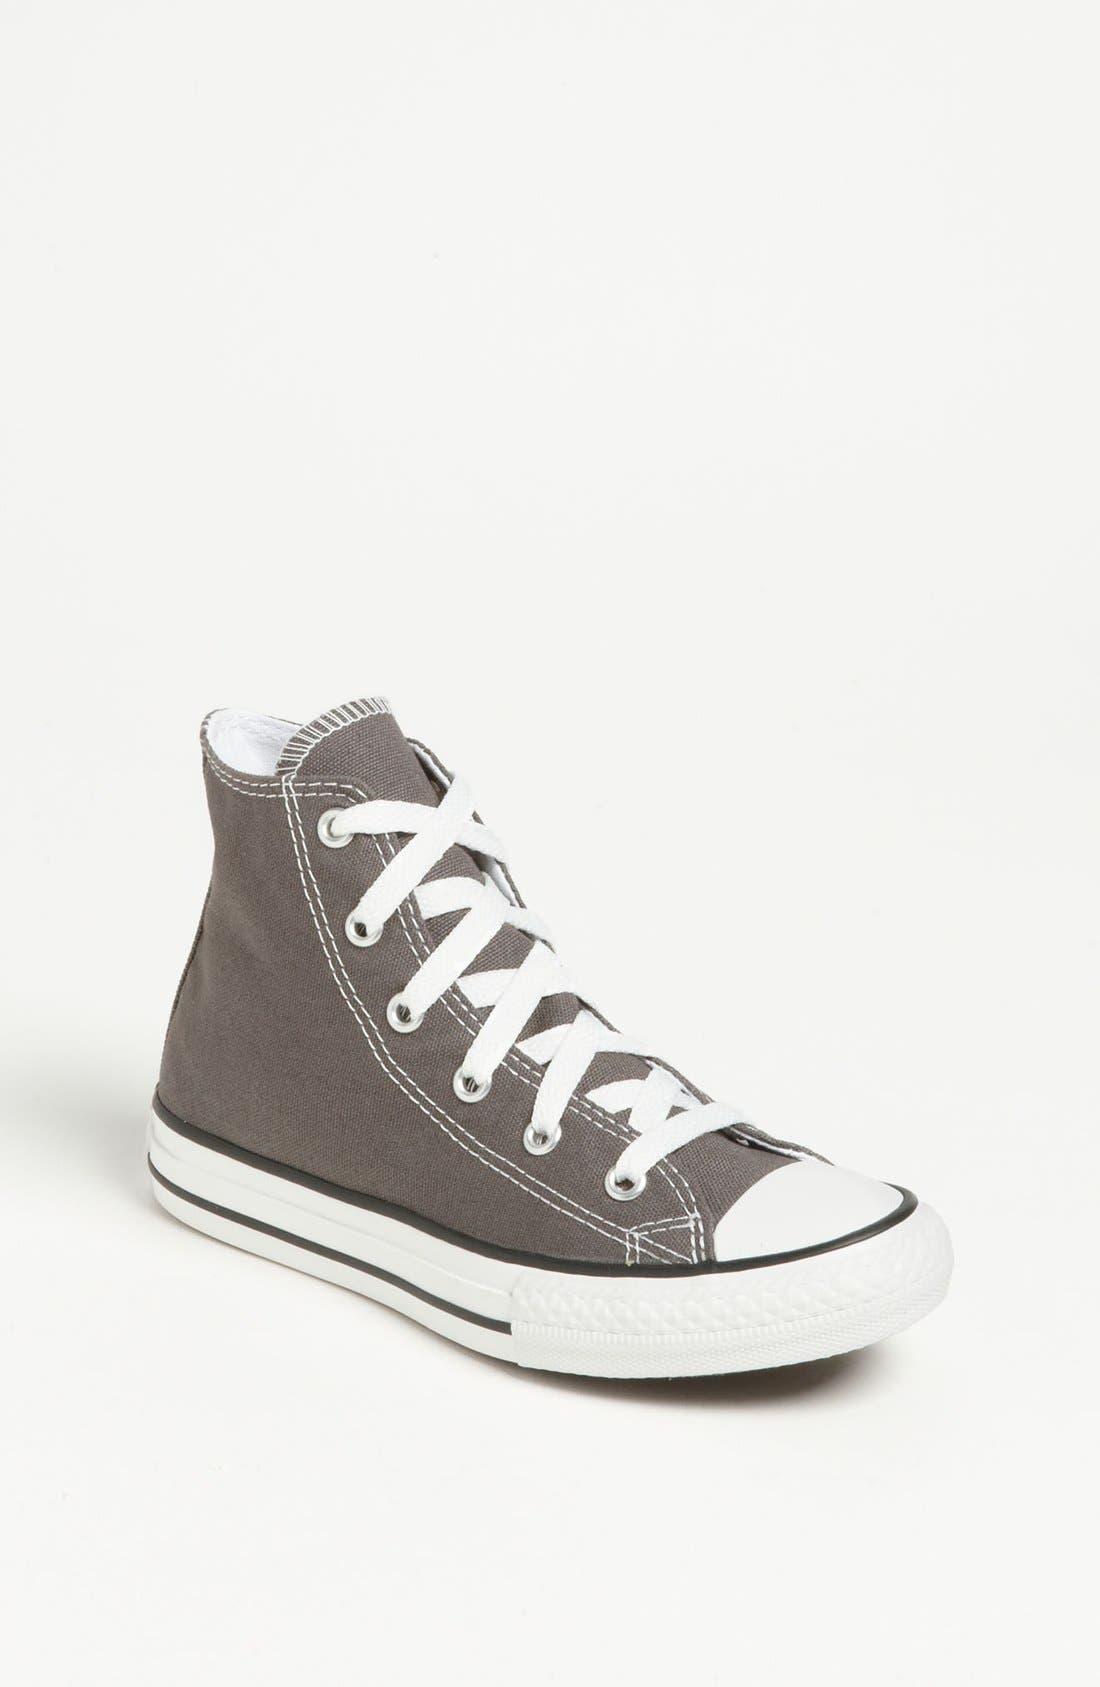 Converse Chuck Taylor® High Top Sneaker (Toddler, Little Kid & Big Kid)